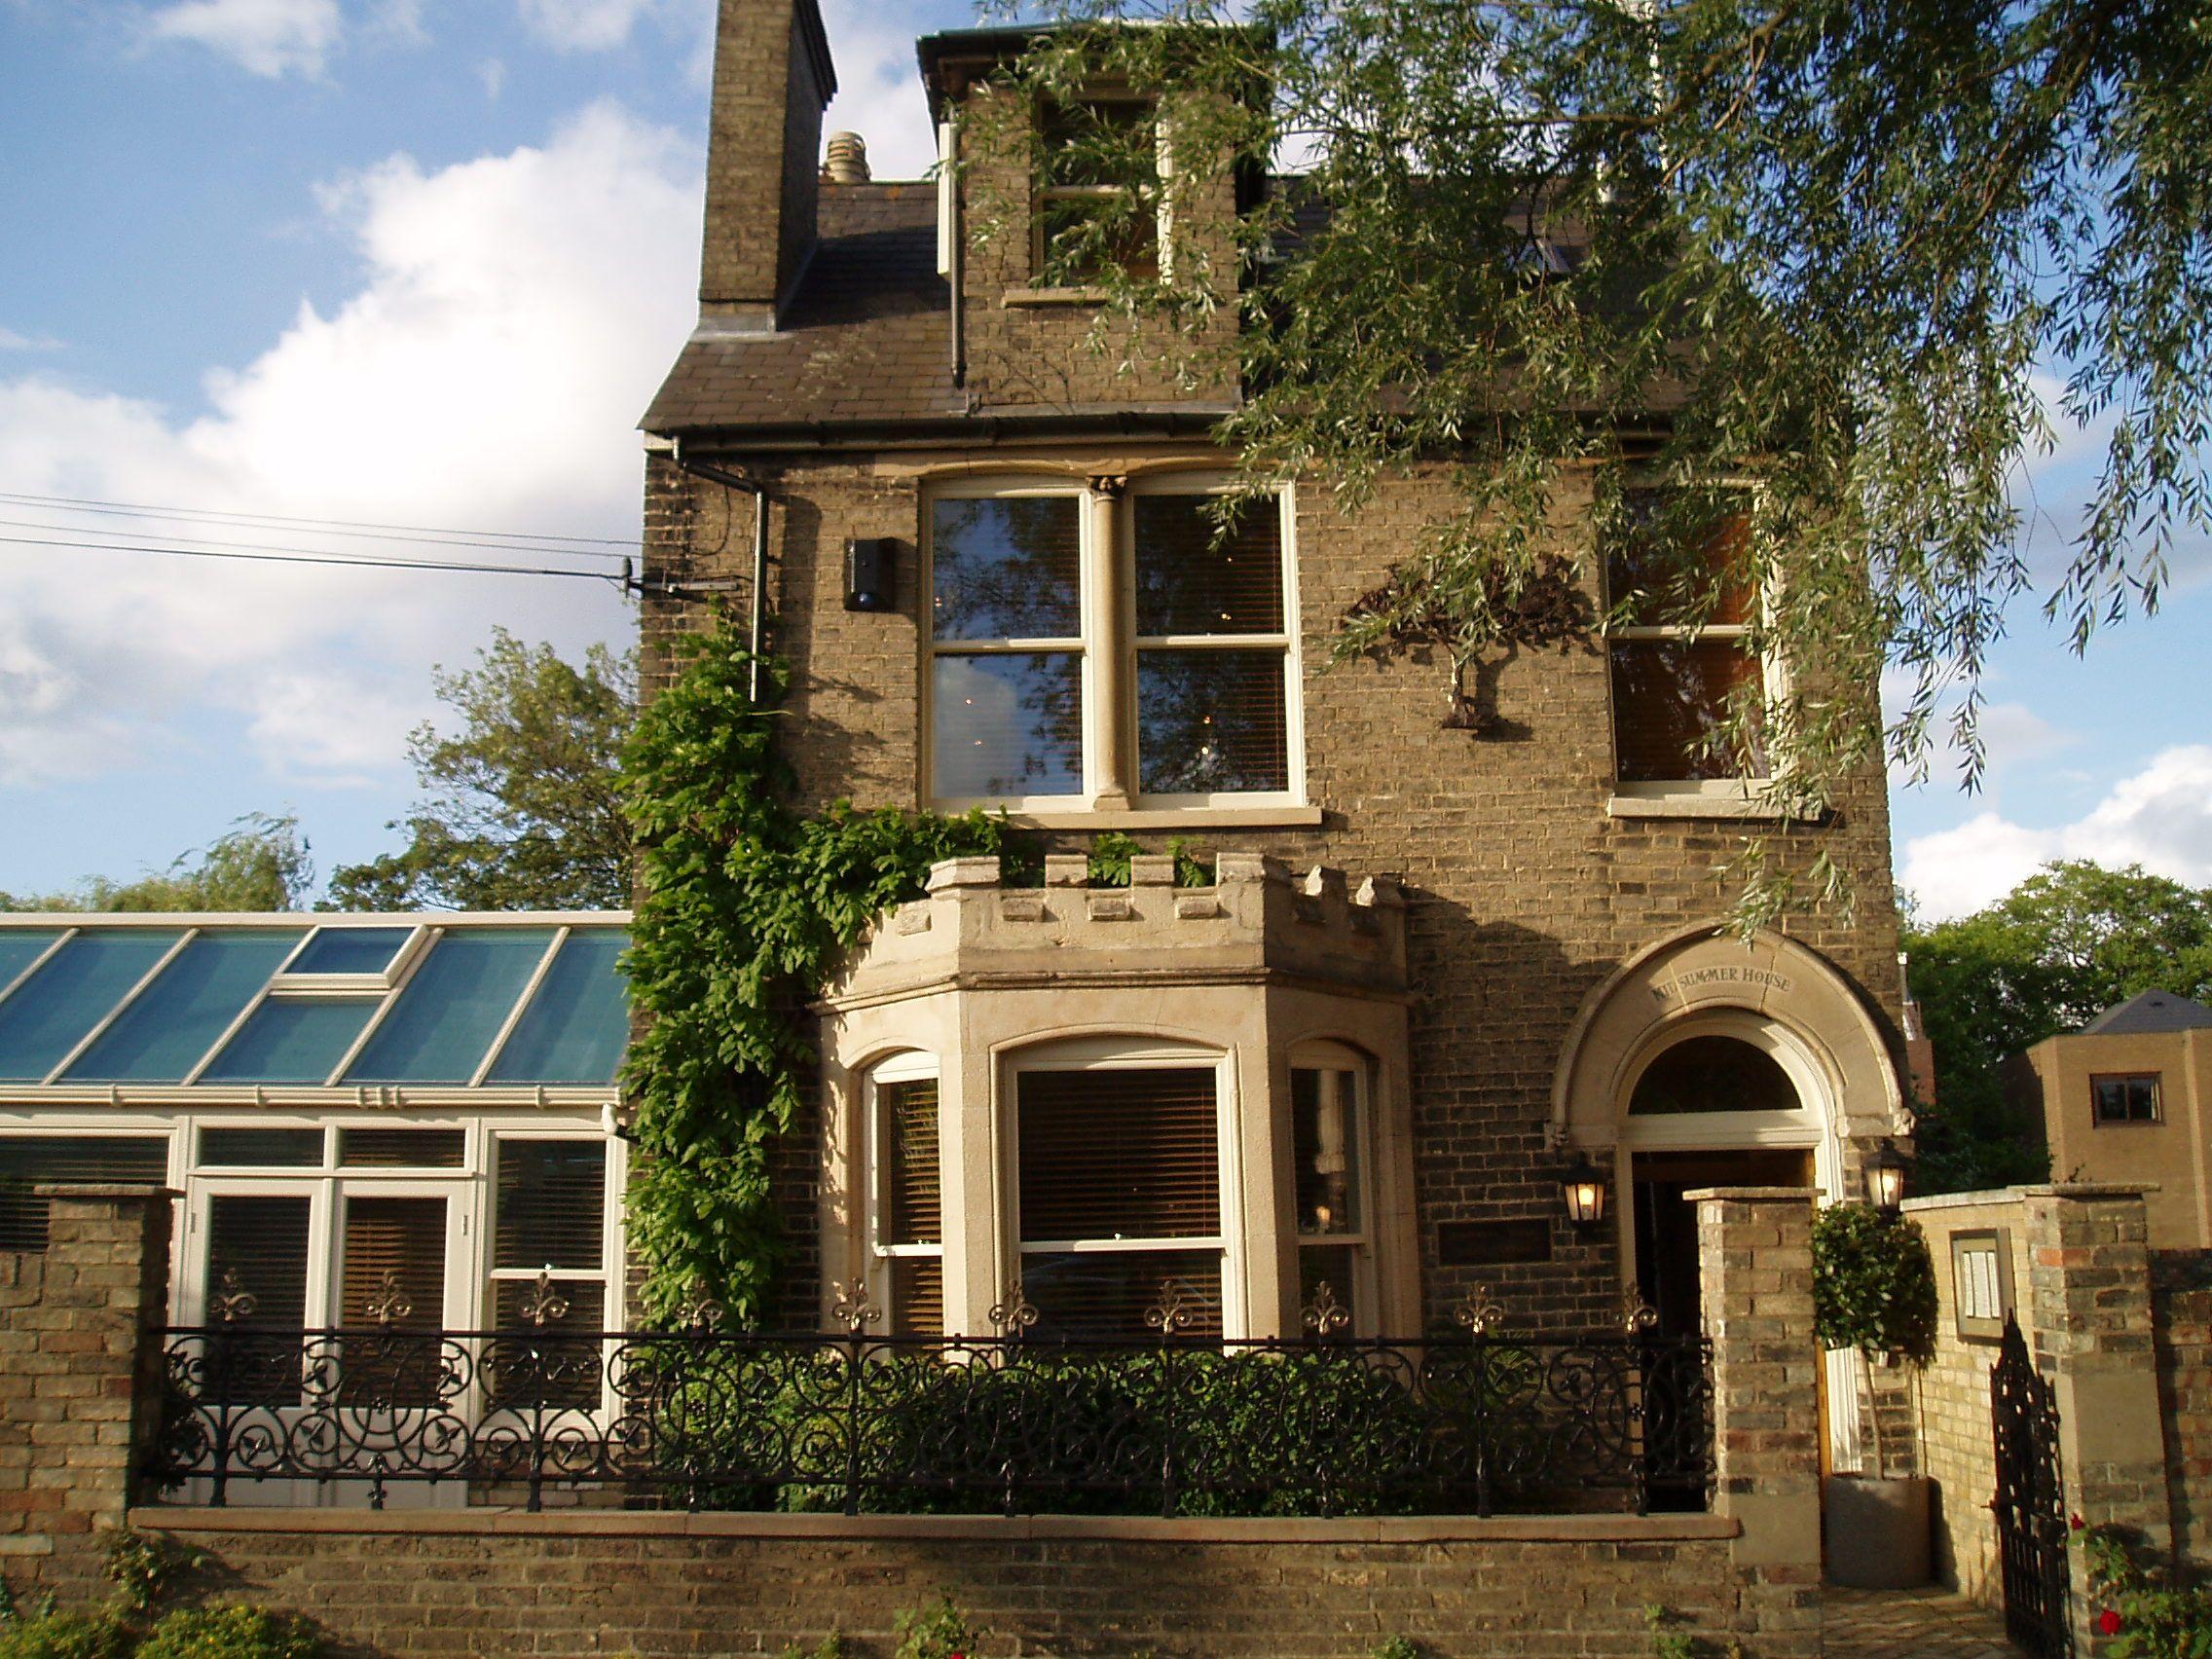 Midsummer House Restaurant Cambridge england and ireland | england, cambridge uk, house restaurant